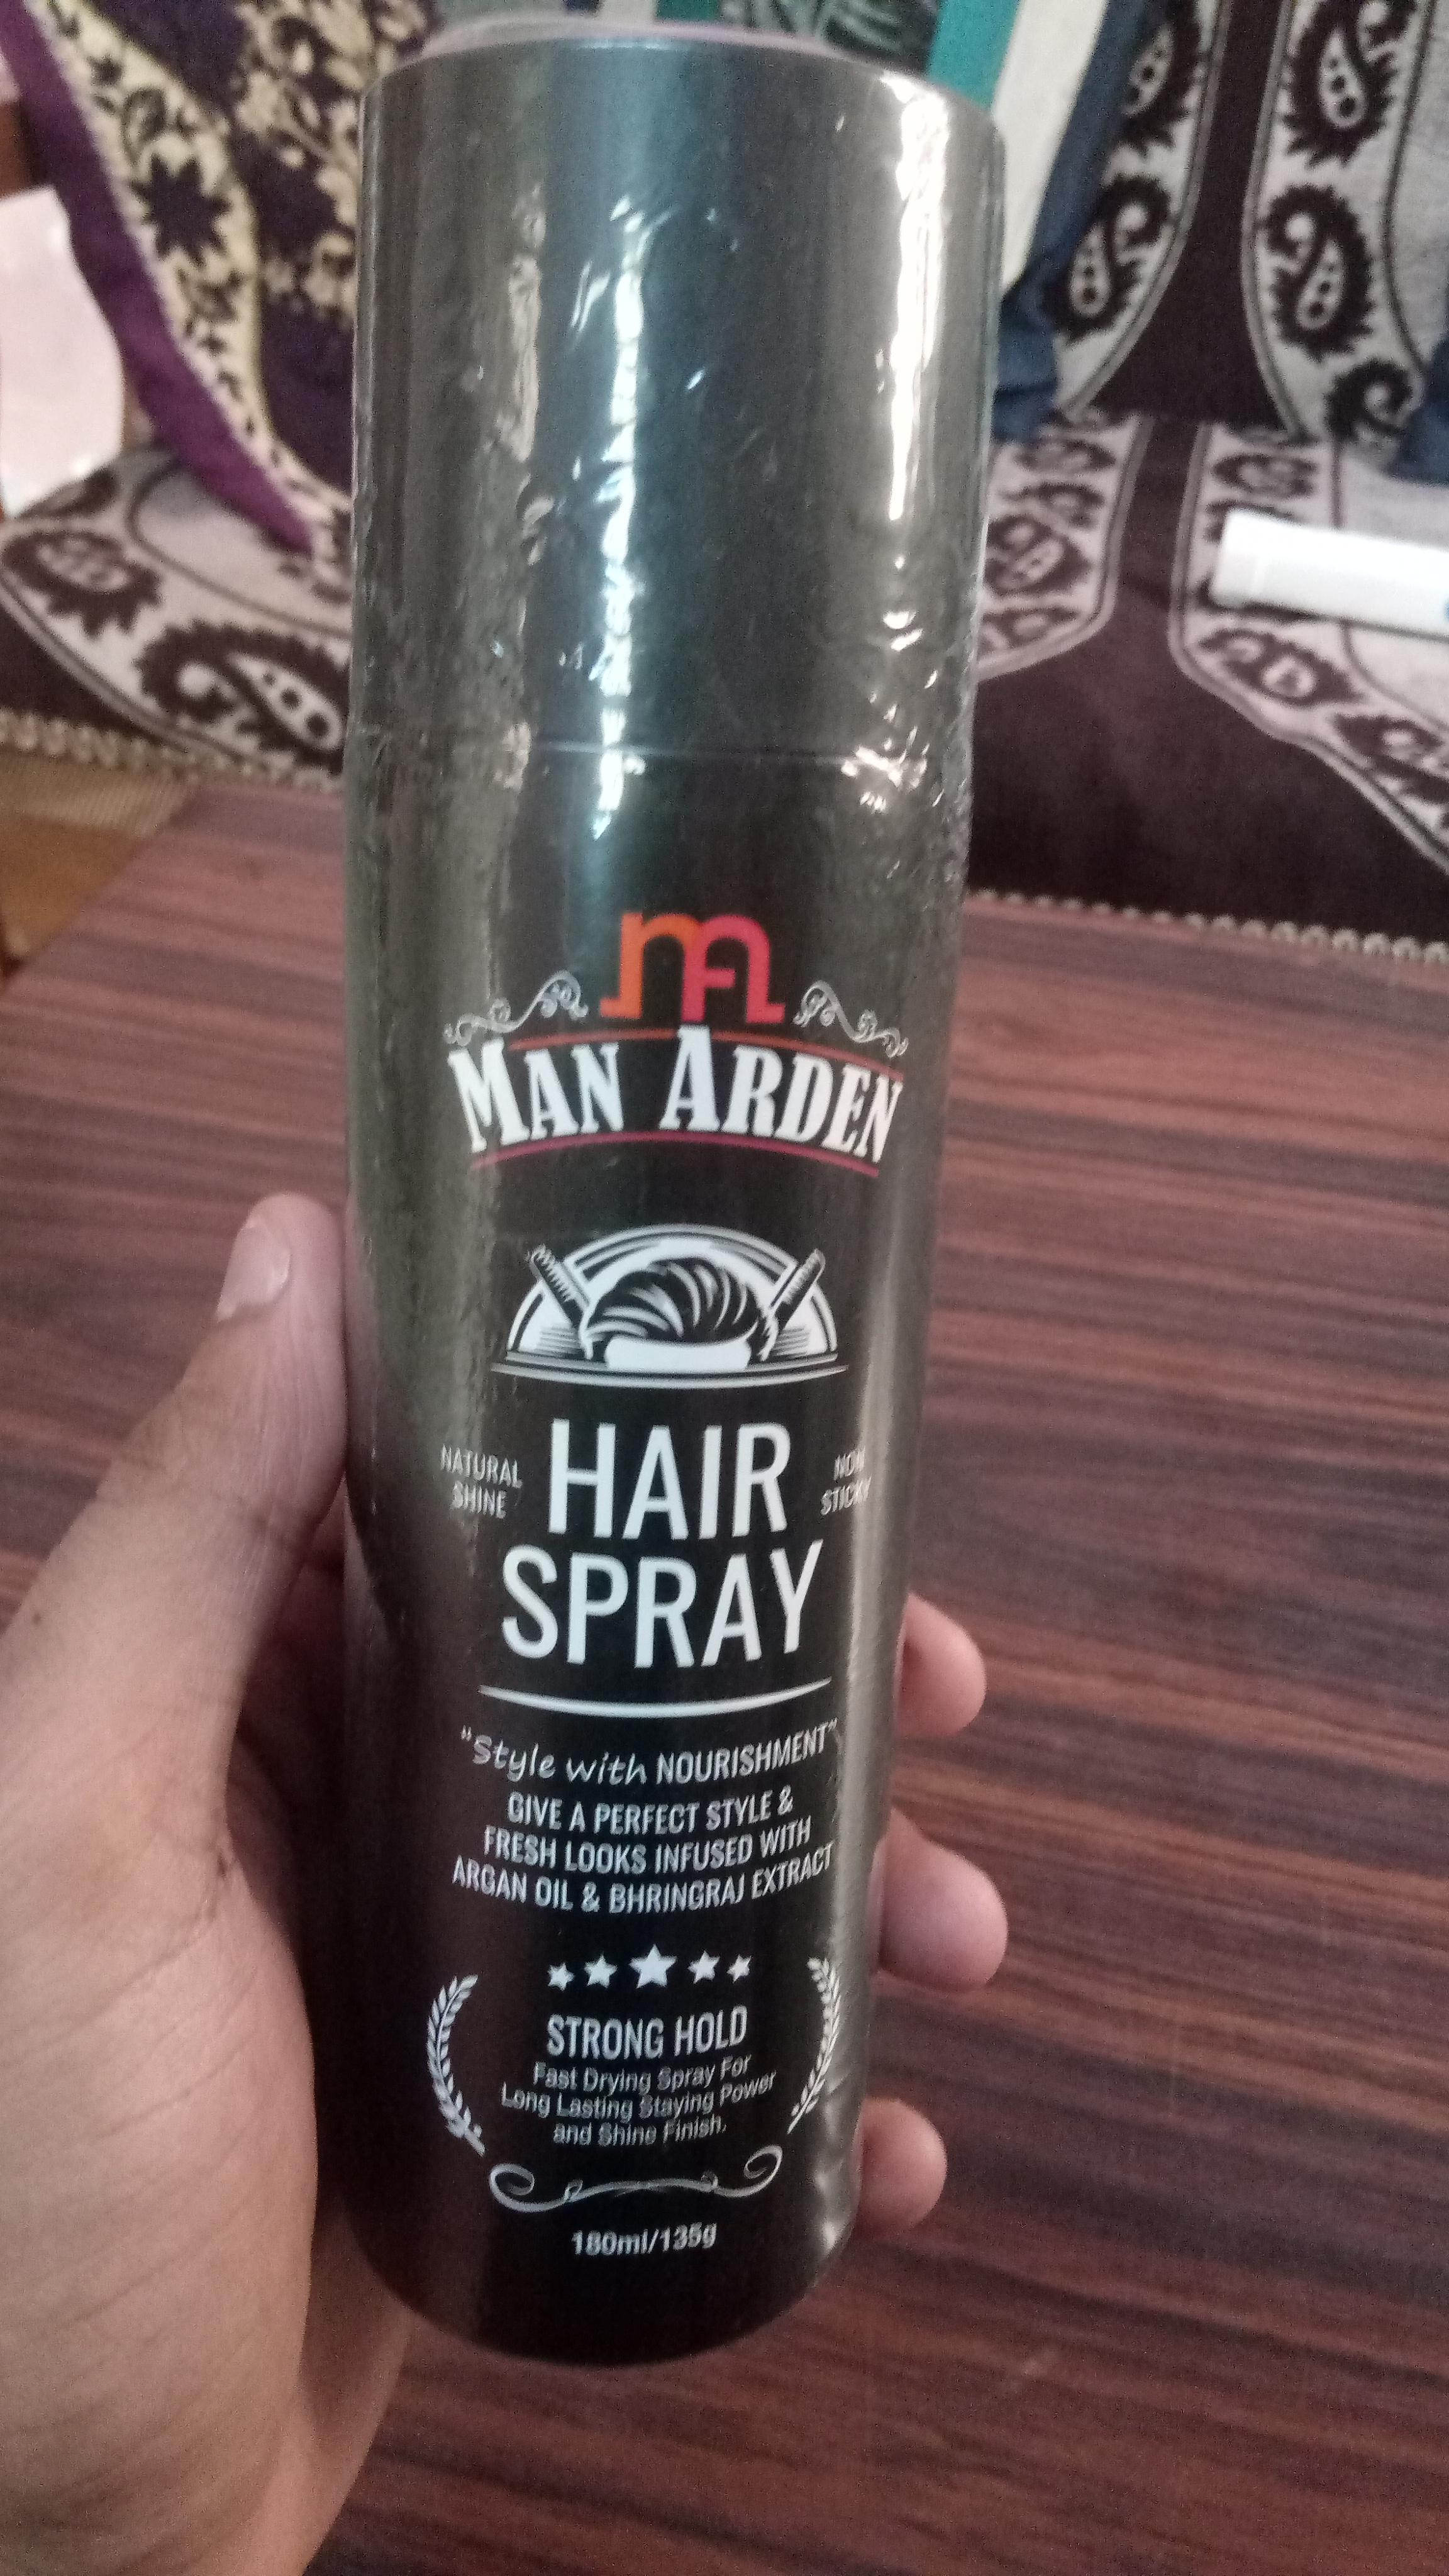 Man Arden Hair Spray-Awesome Hair Spray-By deepaksoni